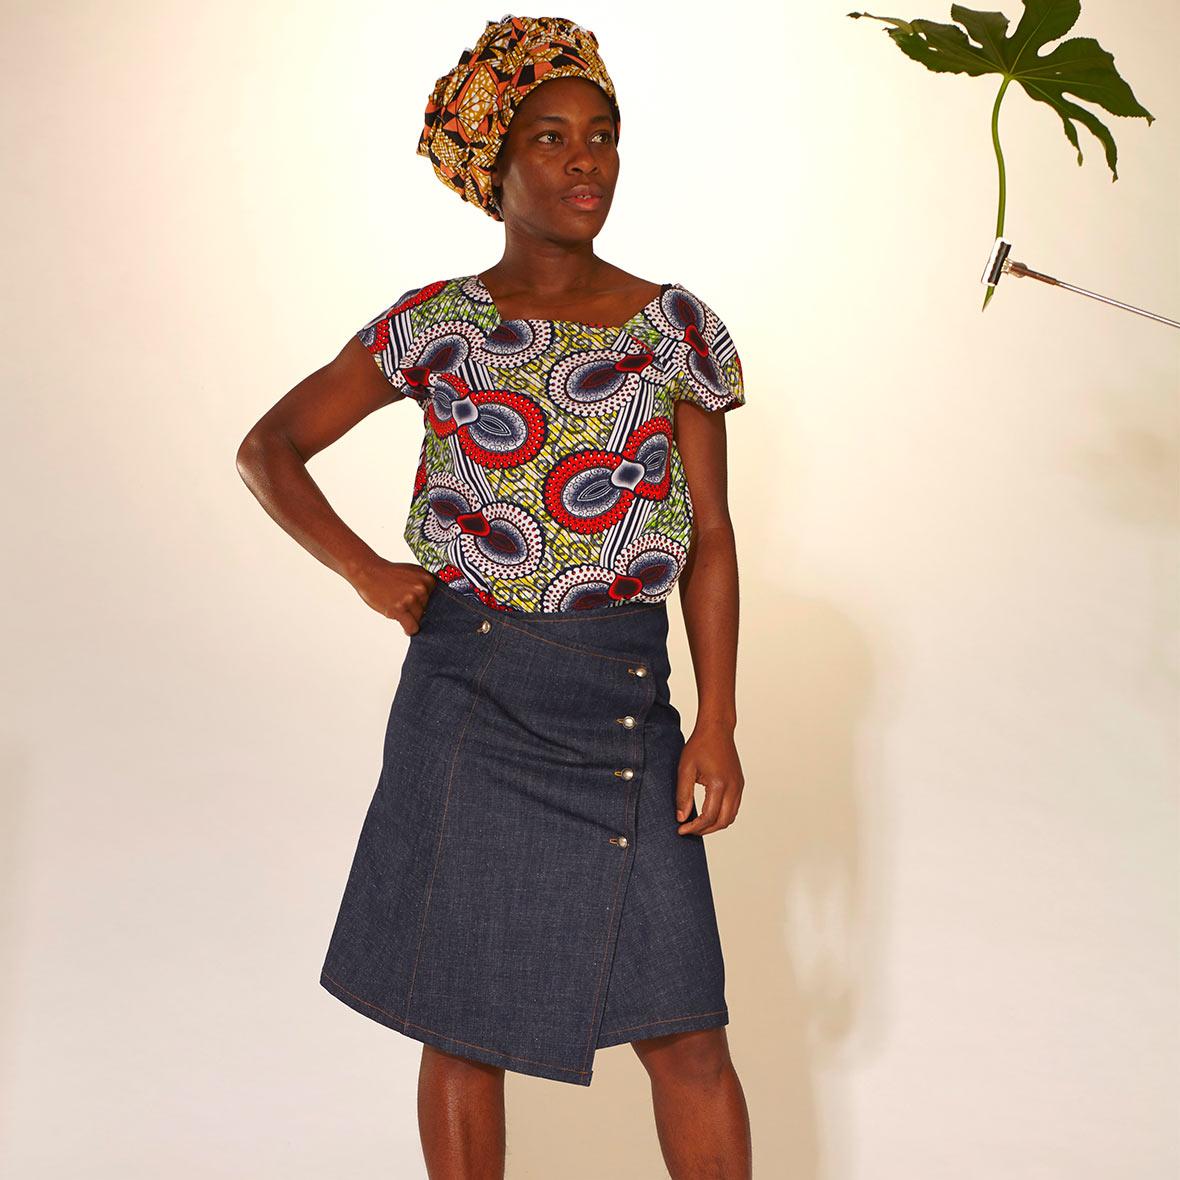 Debora Rentsch Mode fuer die Frau